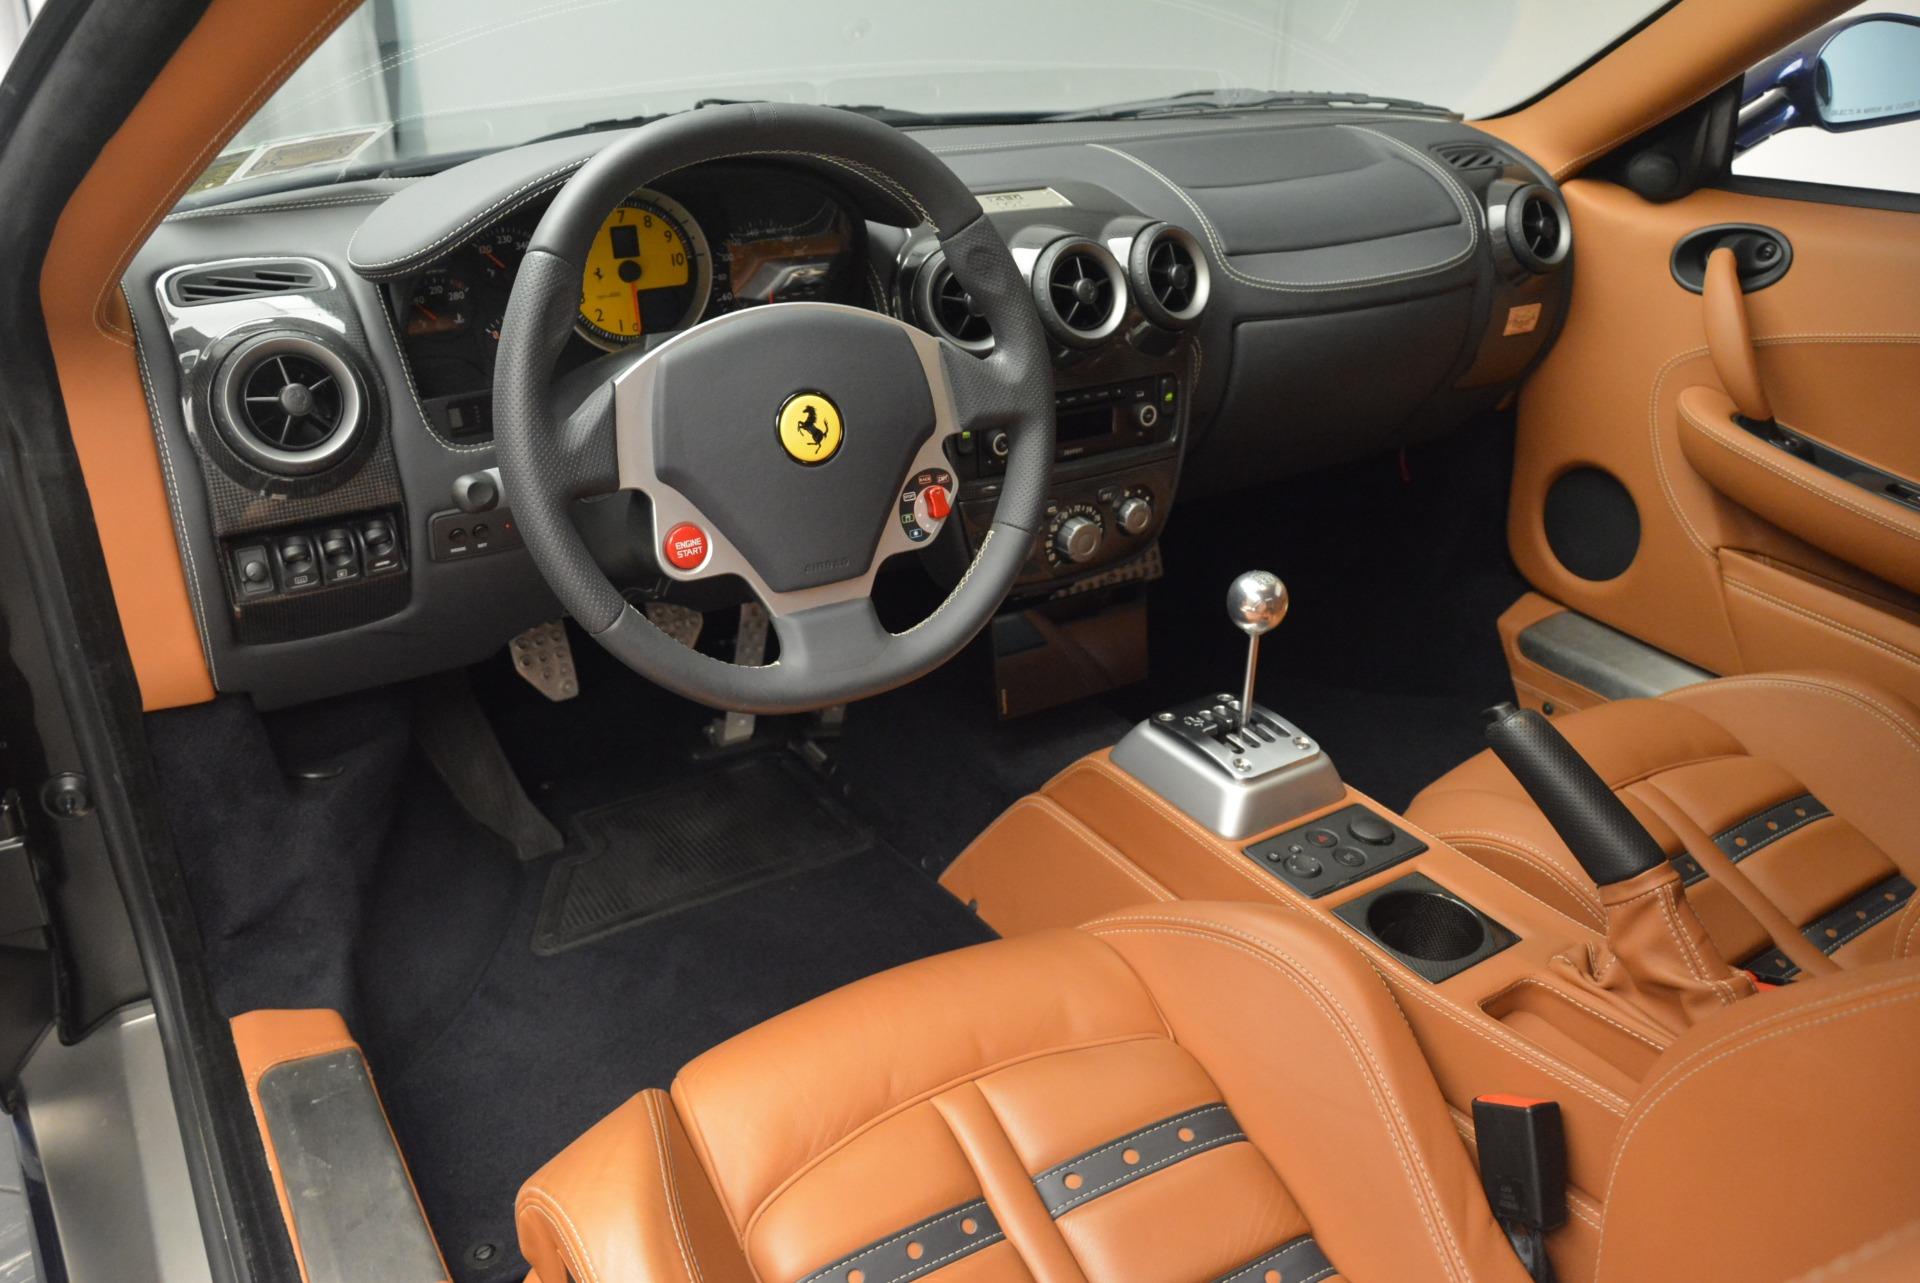 Pre Owned 2009 Ferrari F430 6 Speed Manual For Sale Miller Motorcars Stock 4496c